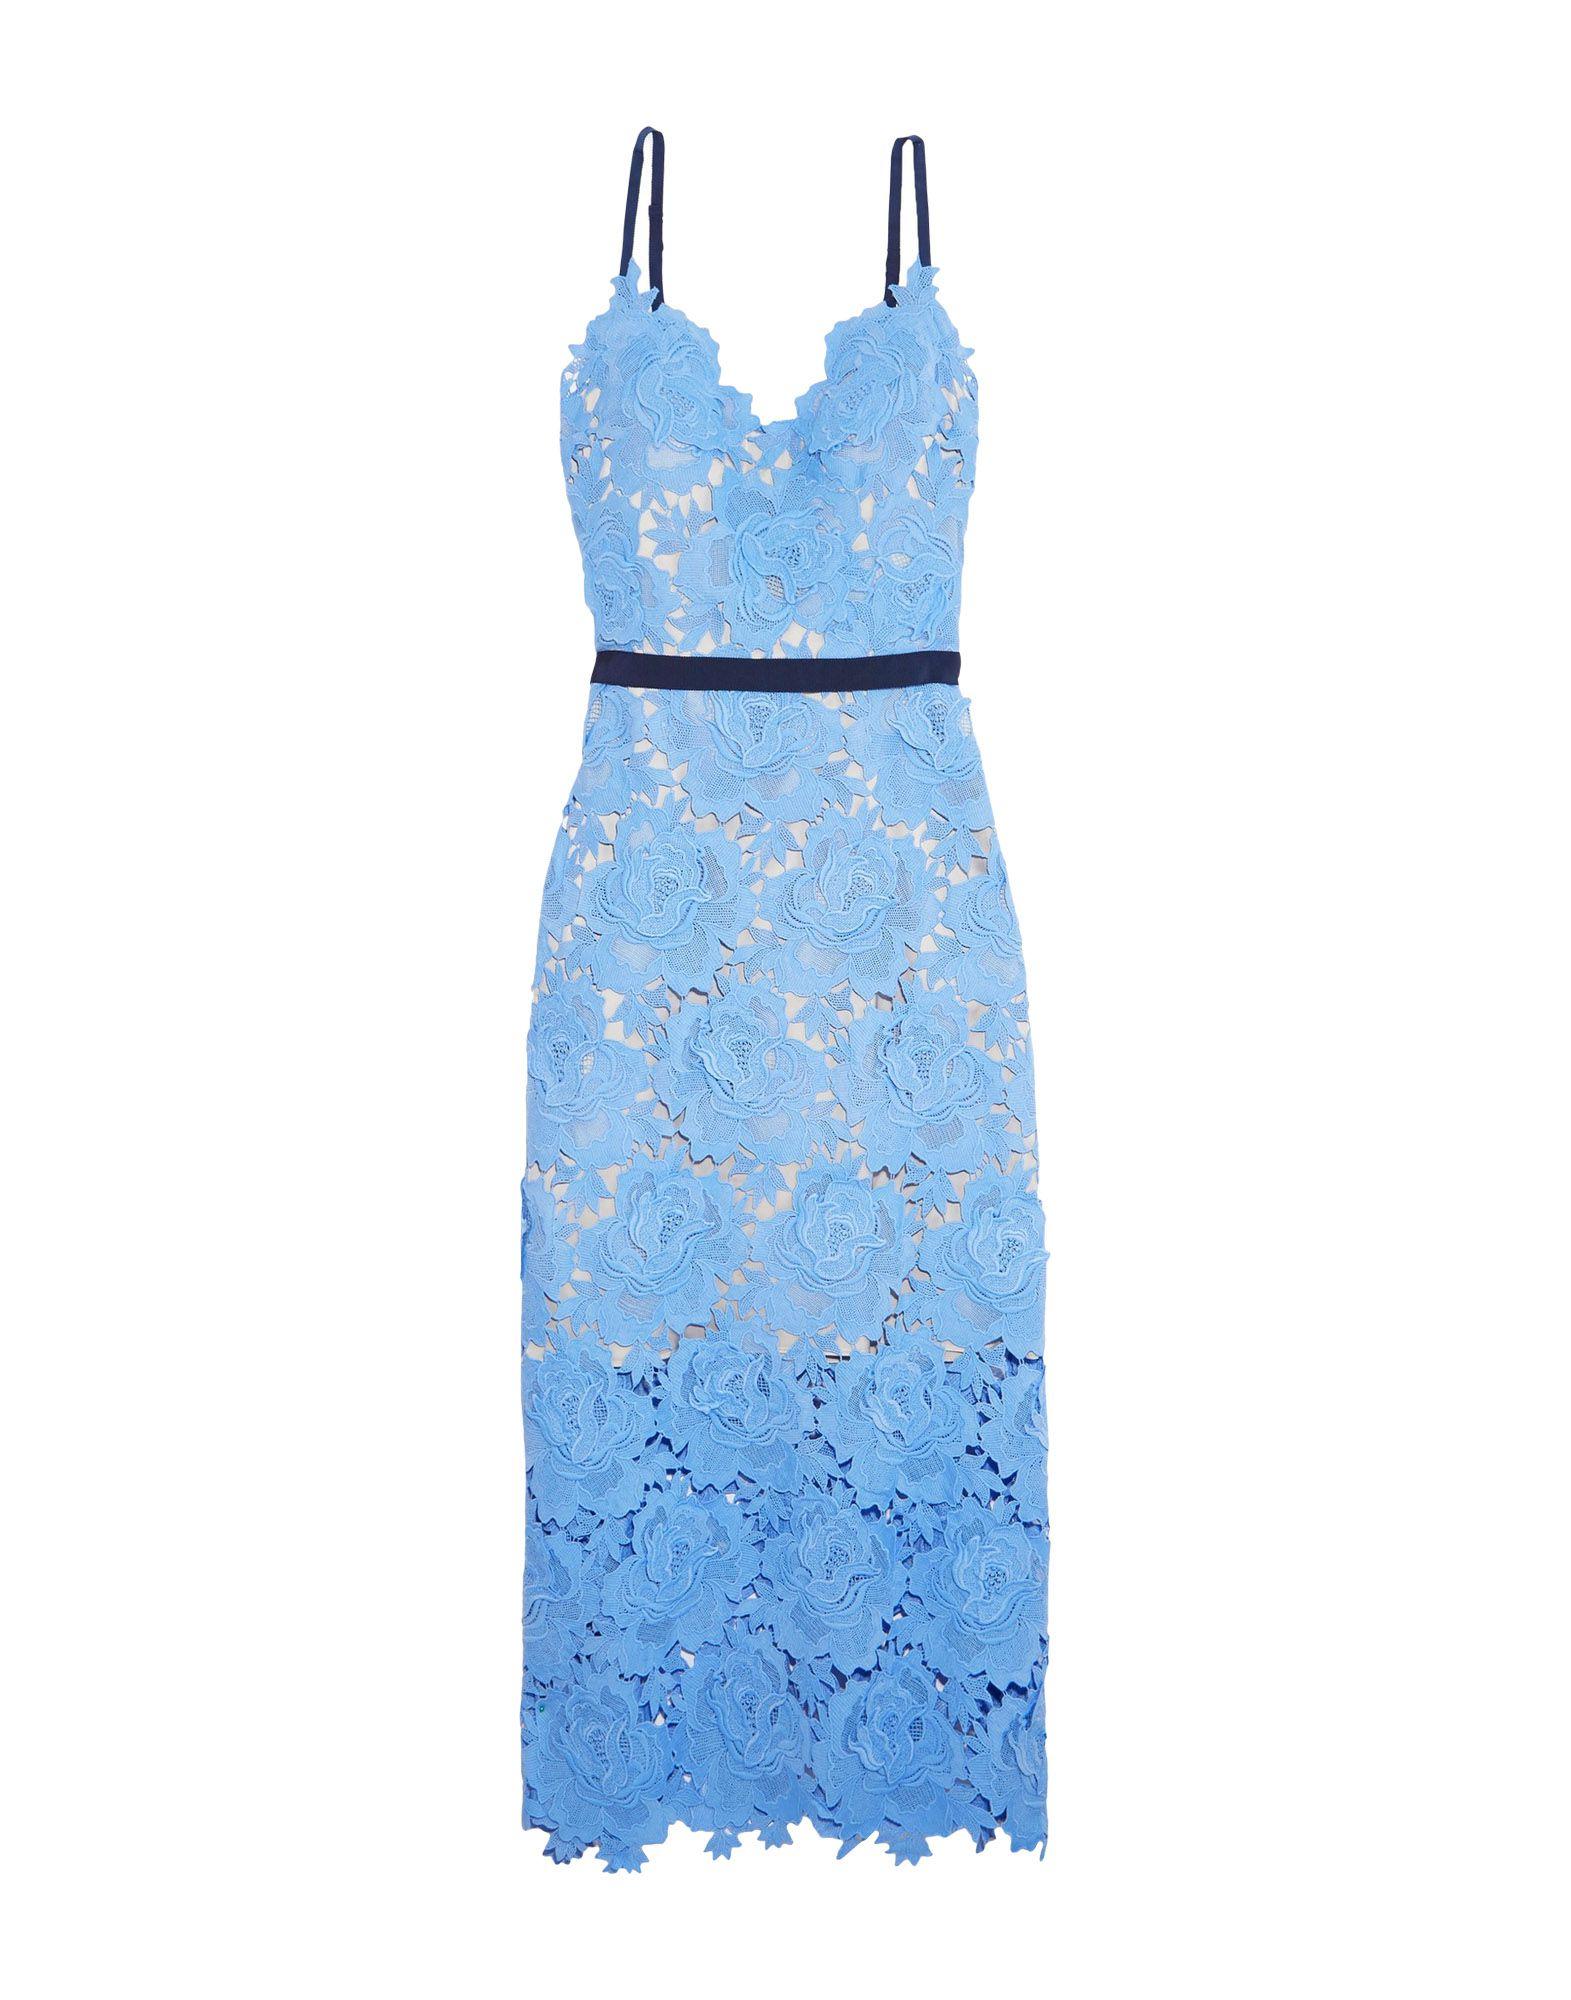 CATHERINE DEANE Woman Frida Guipure Lace Midi Dress Light Blue